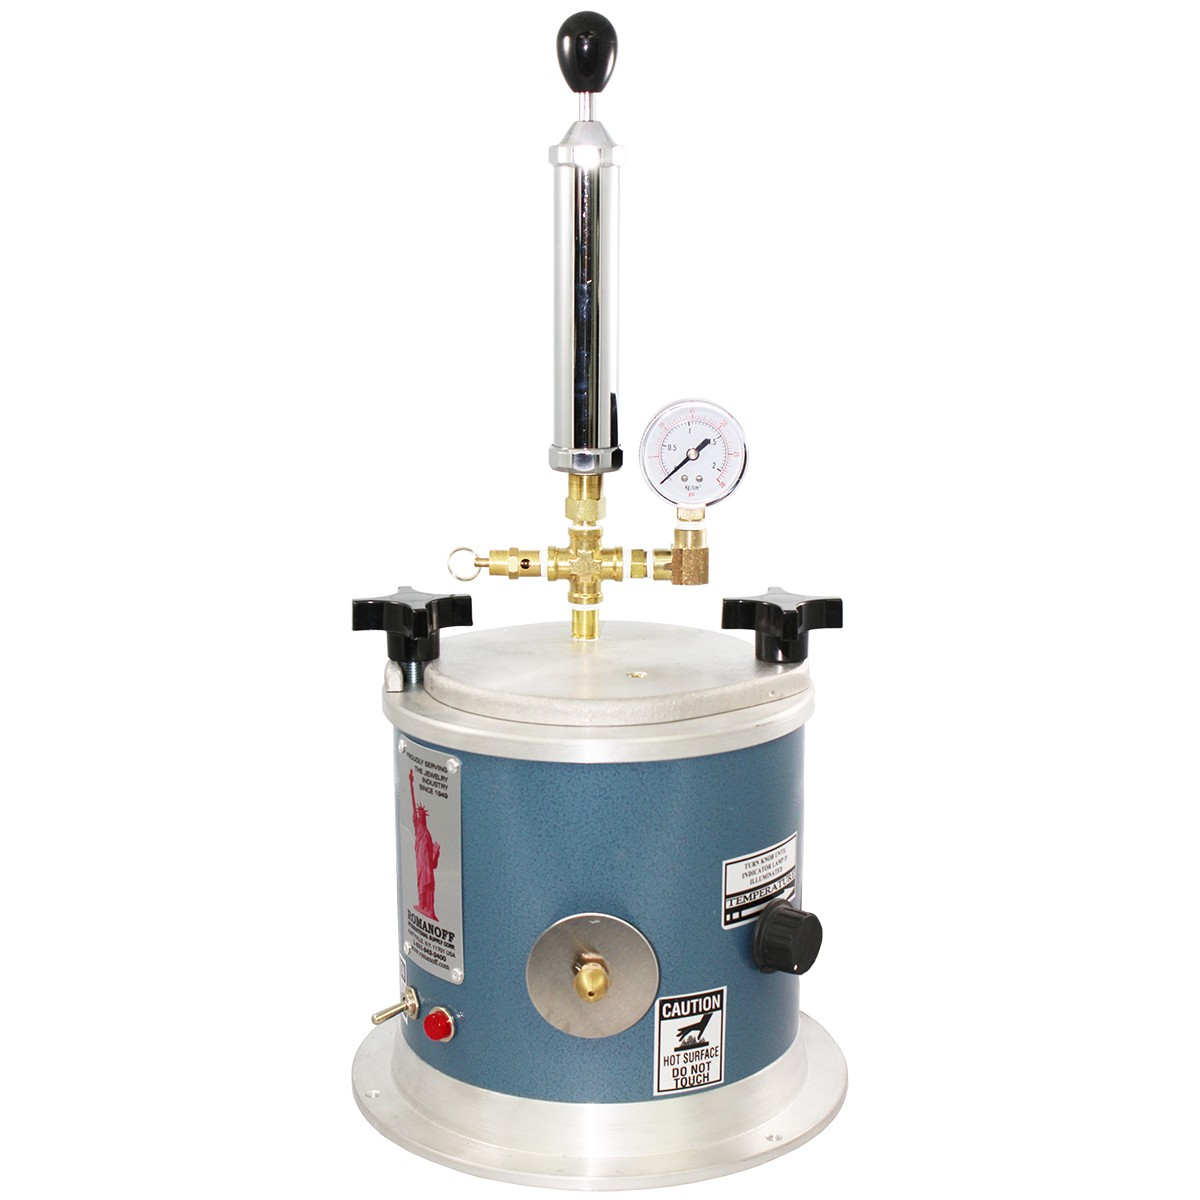 Mini Wax Injector With Hand Pump - 1-1/3 Qt